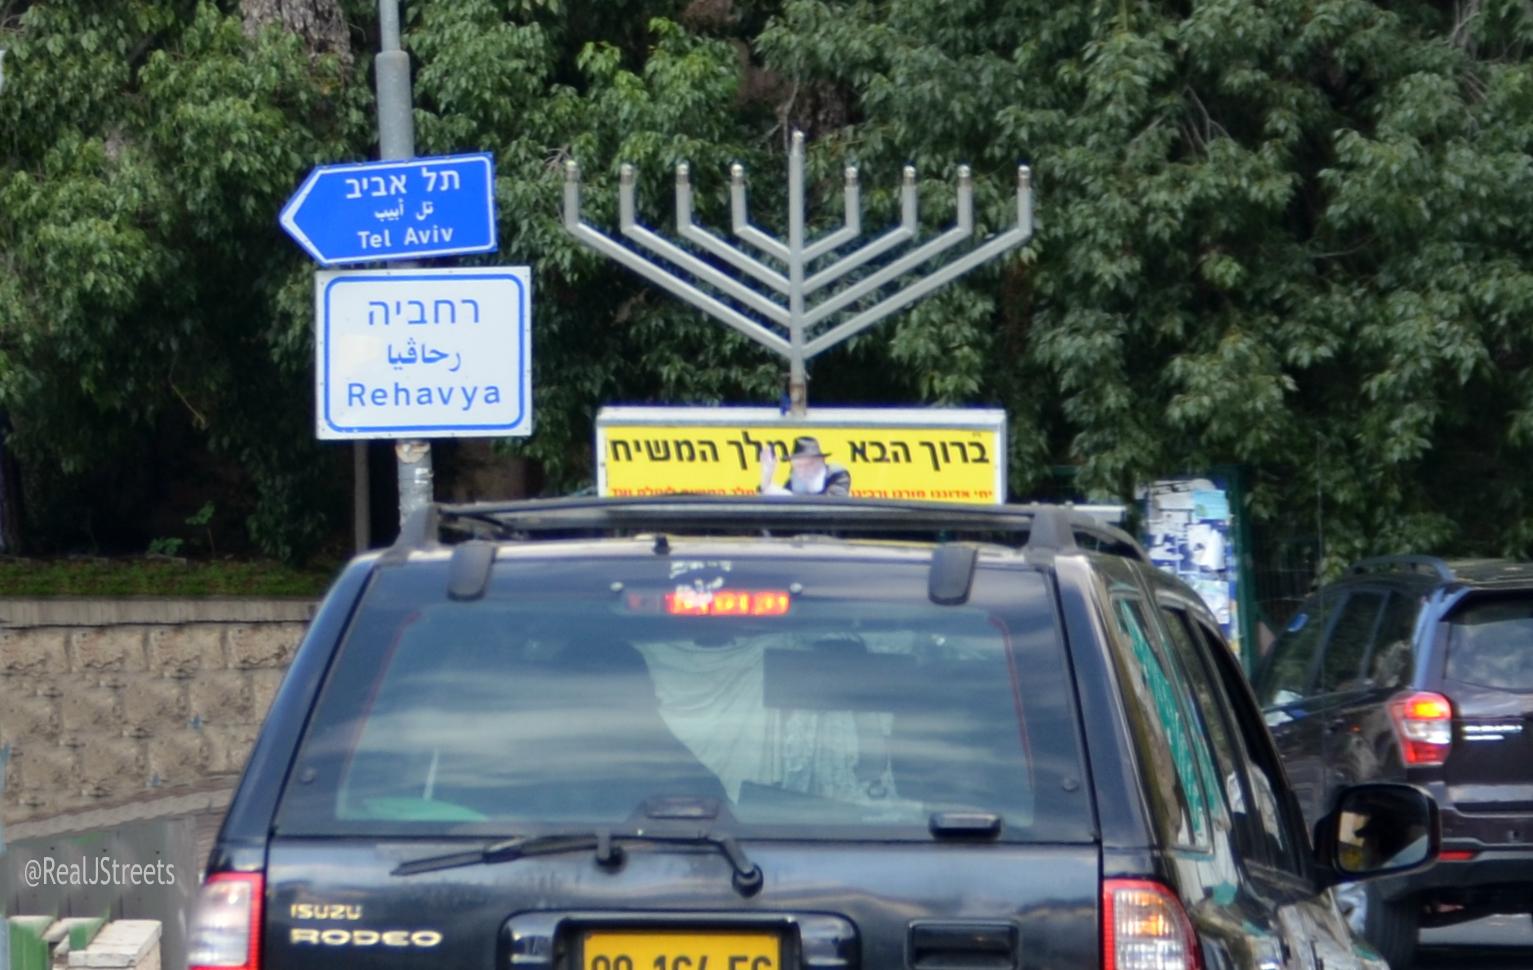 Chabad chaunka menorah on car